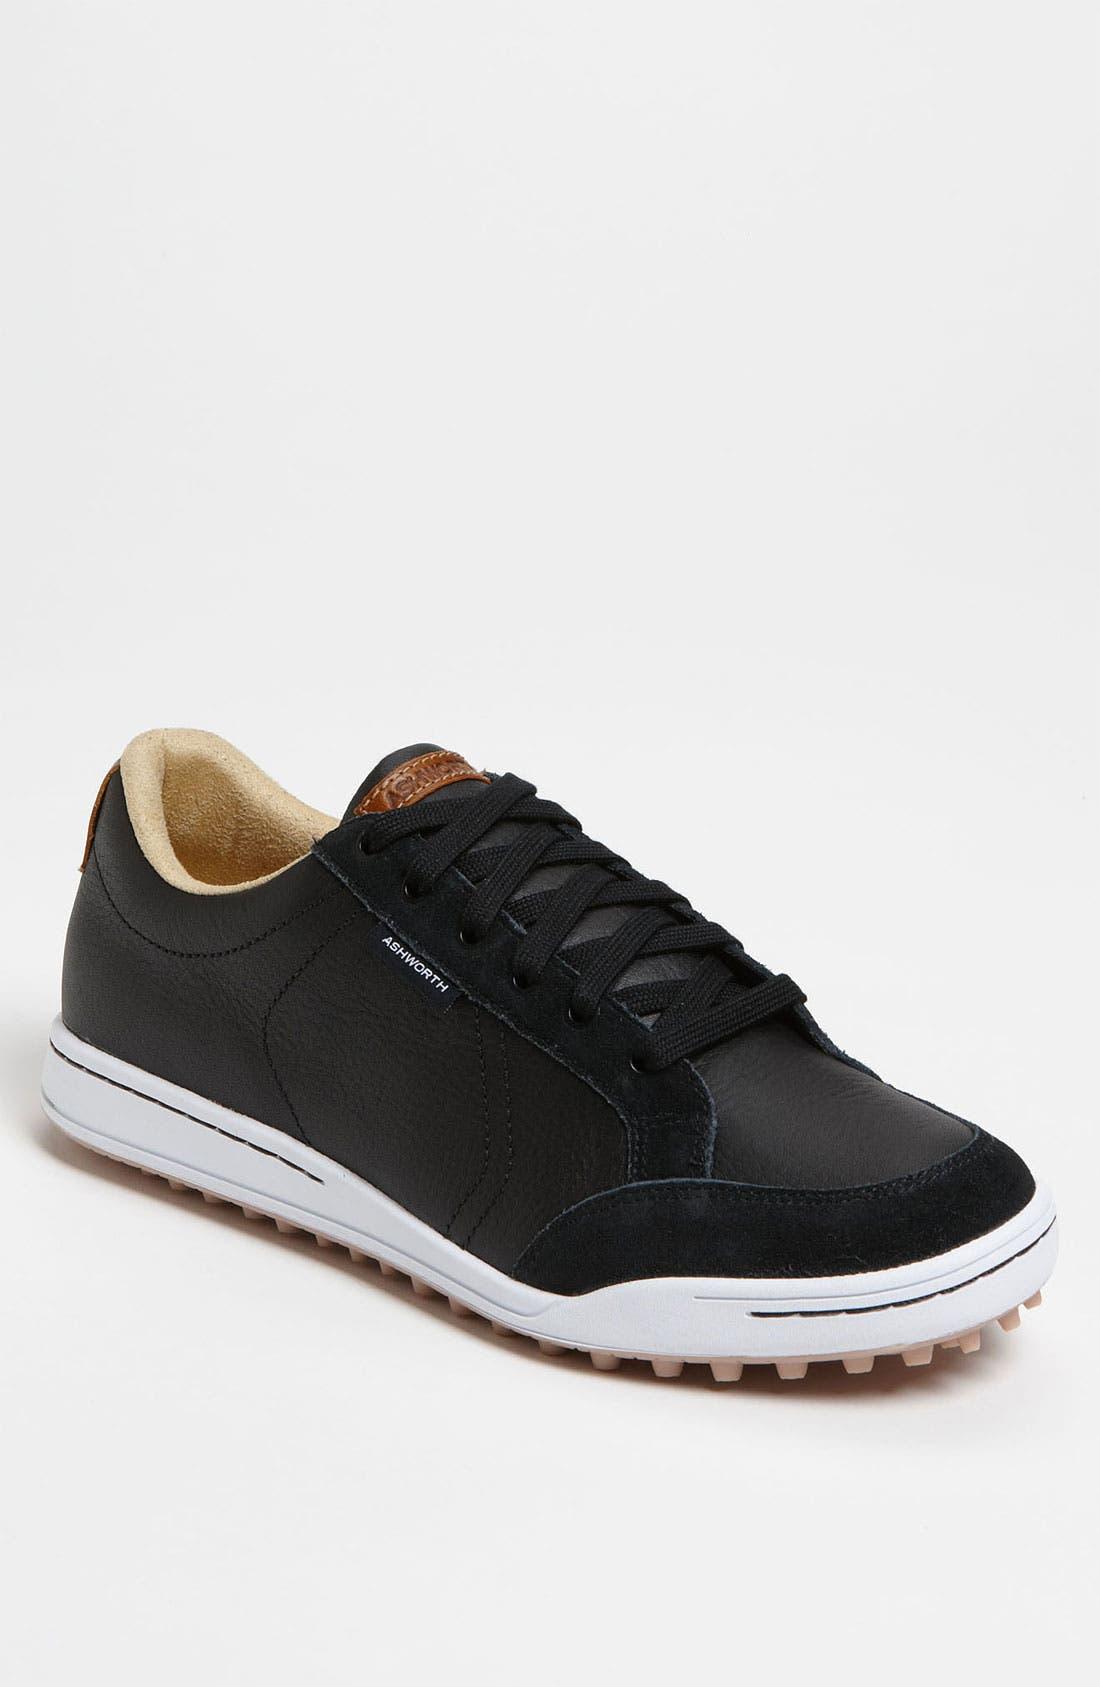 Alternate Image 1 Selected - Ashworth Golf 'Cardiff' Golf Shoe (Men) (Online Only)